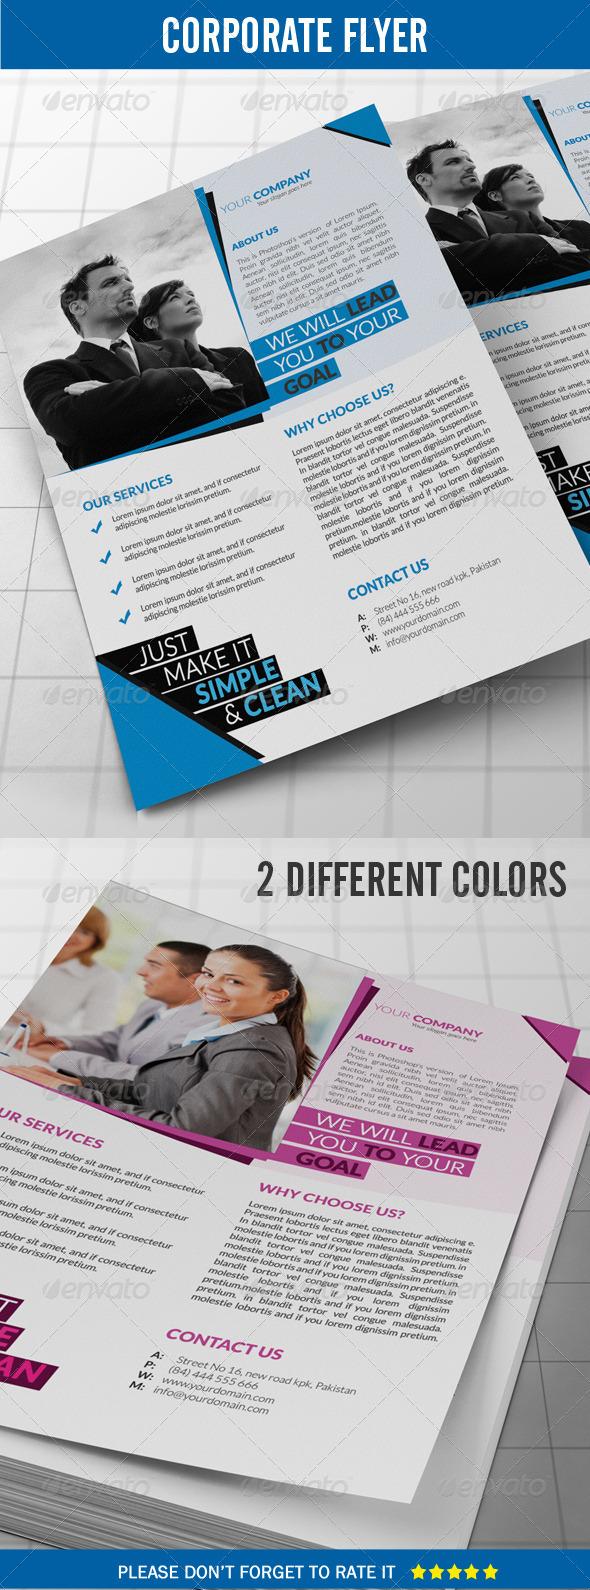 GraphicRiver Corporate Flyer 8323786